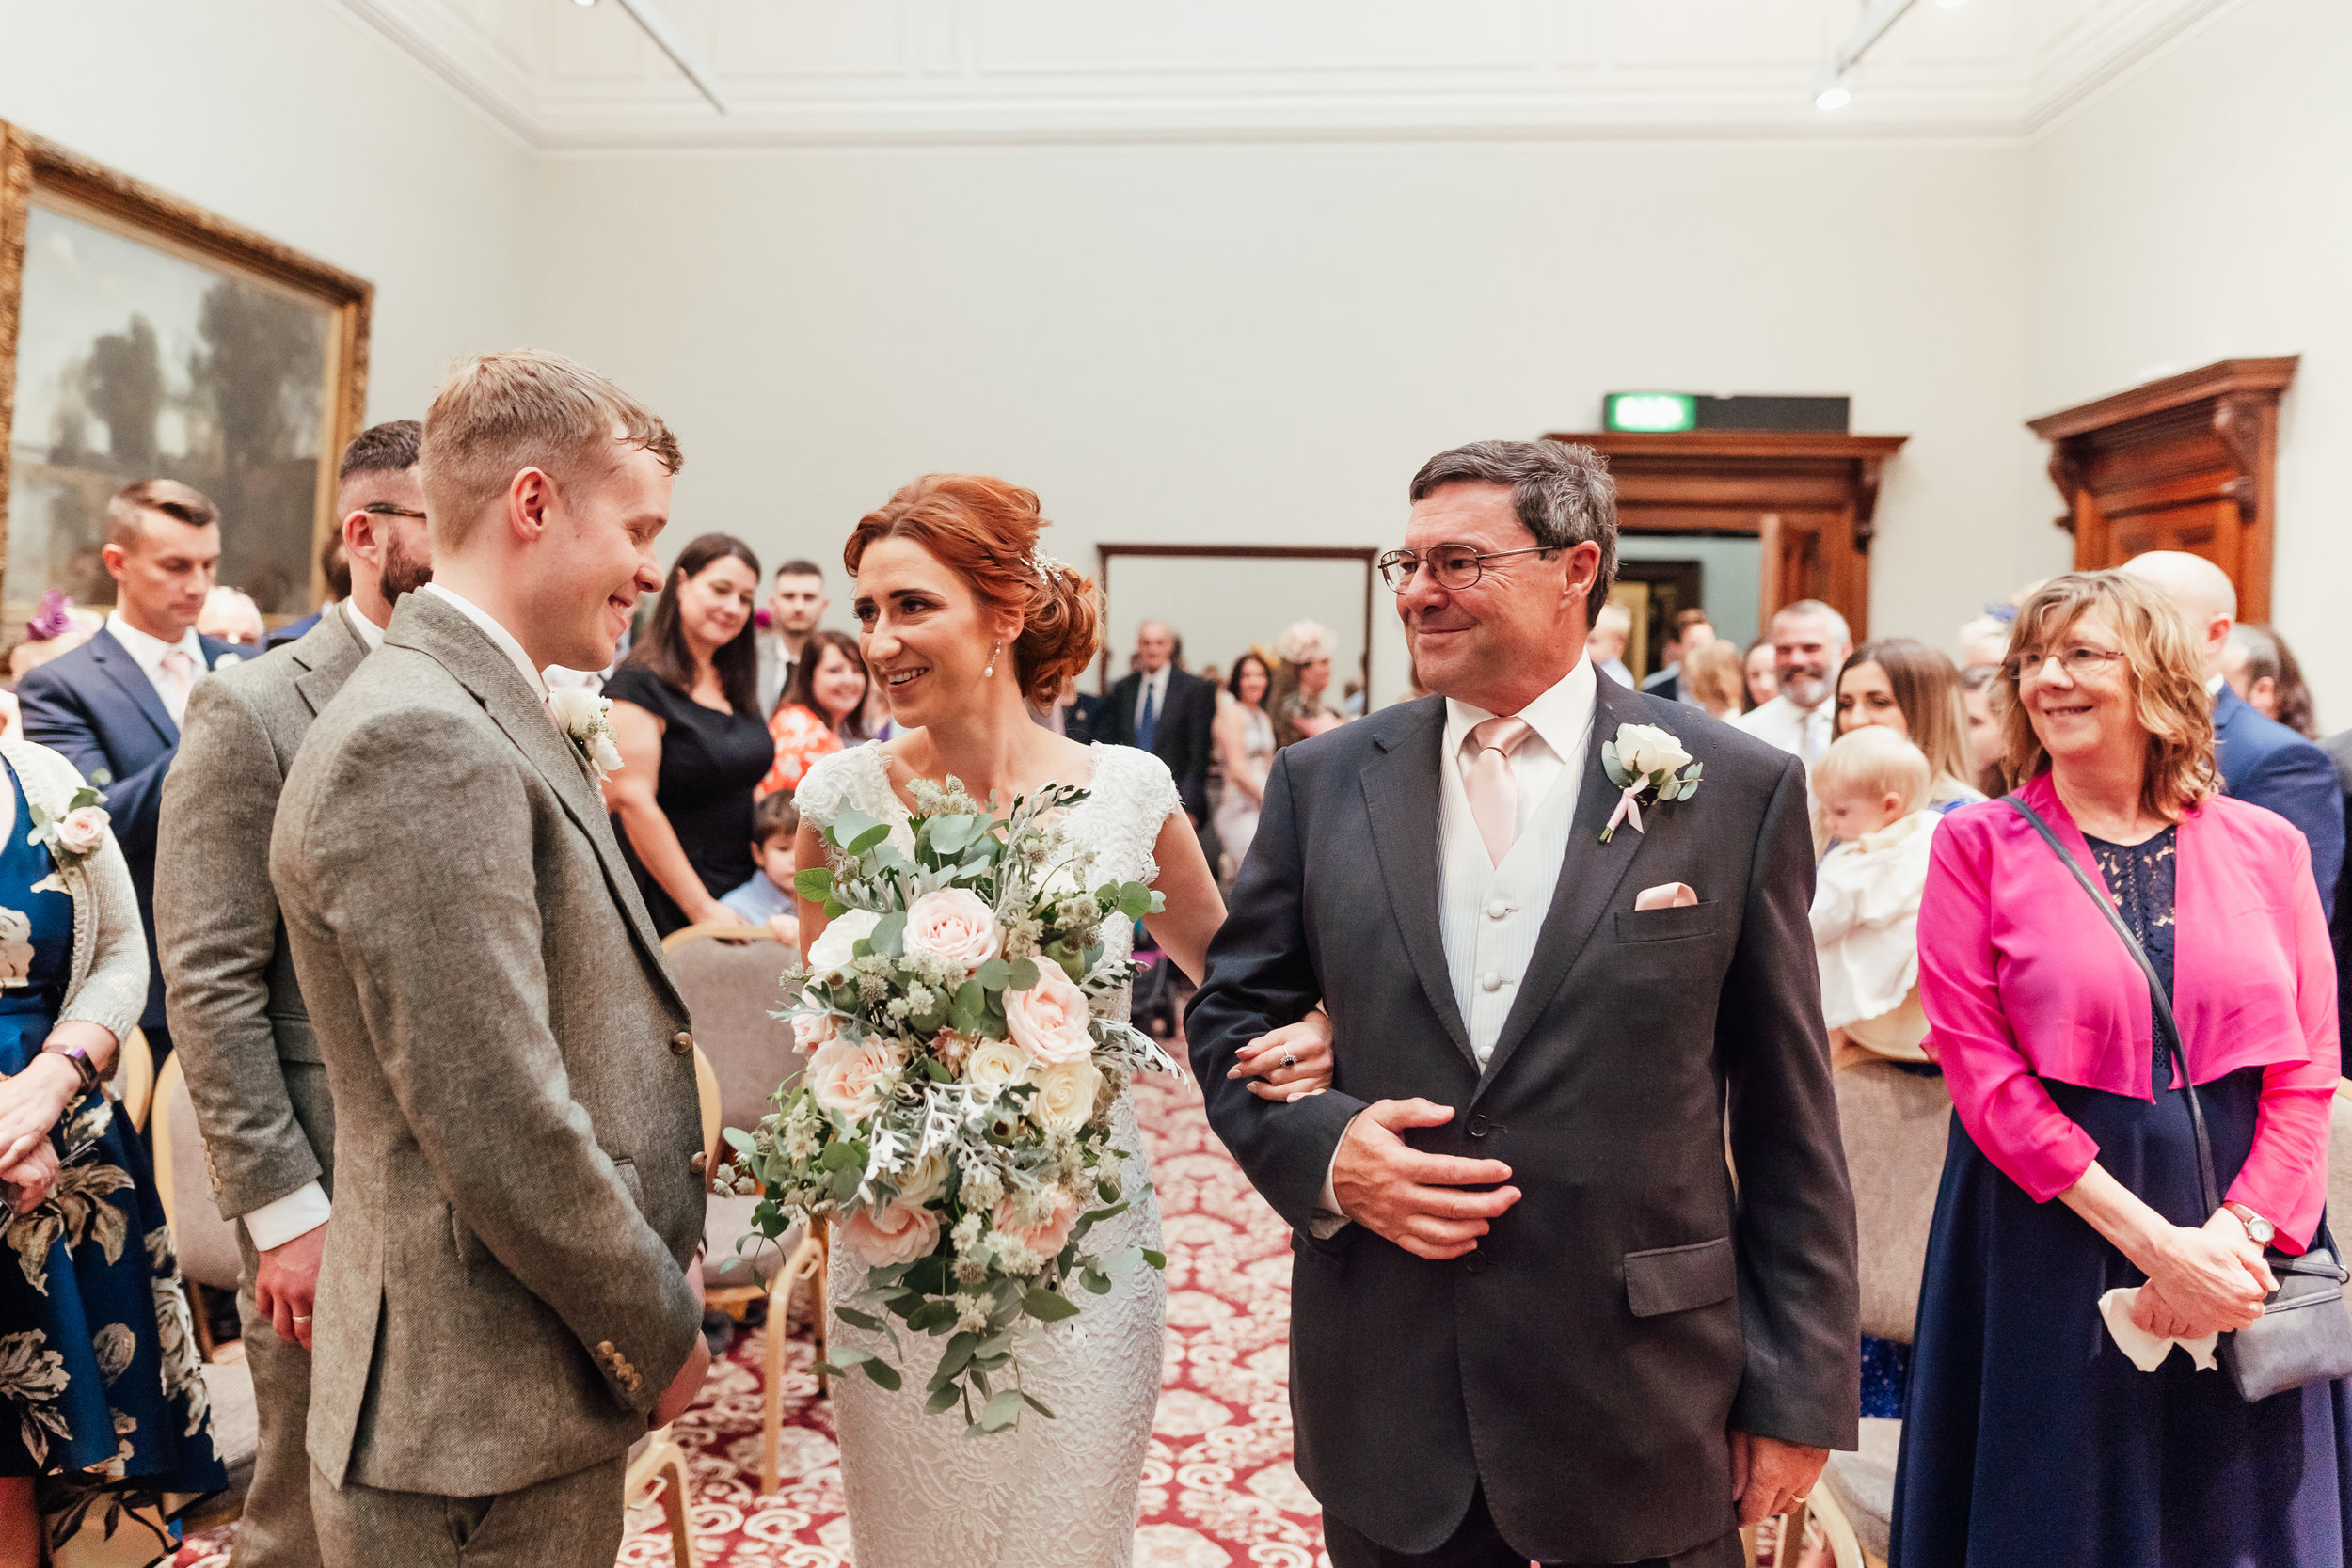 st-georges-hall-liverpool-wedding-78.jpg